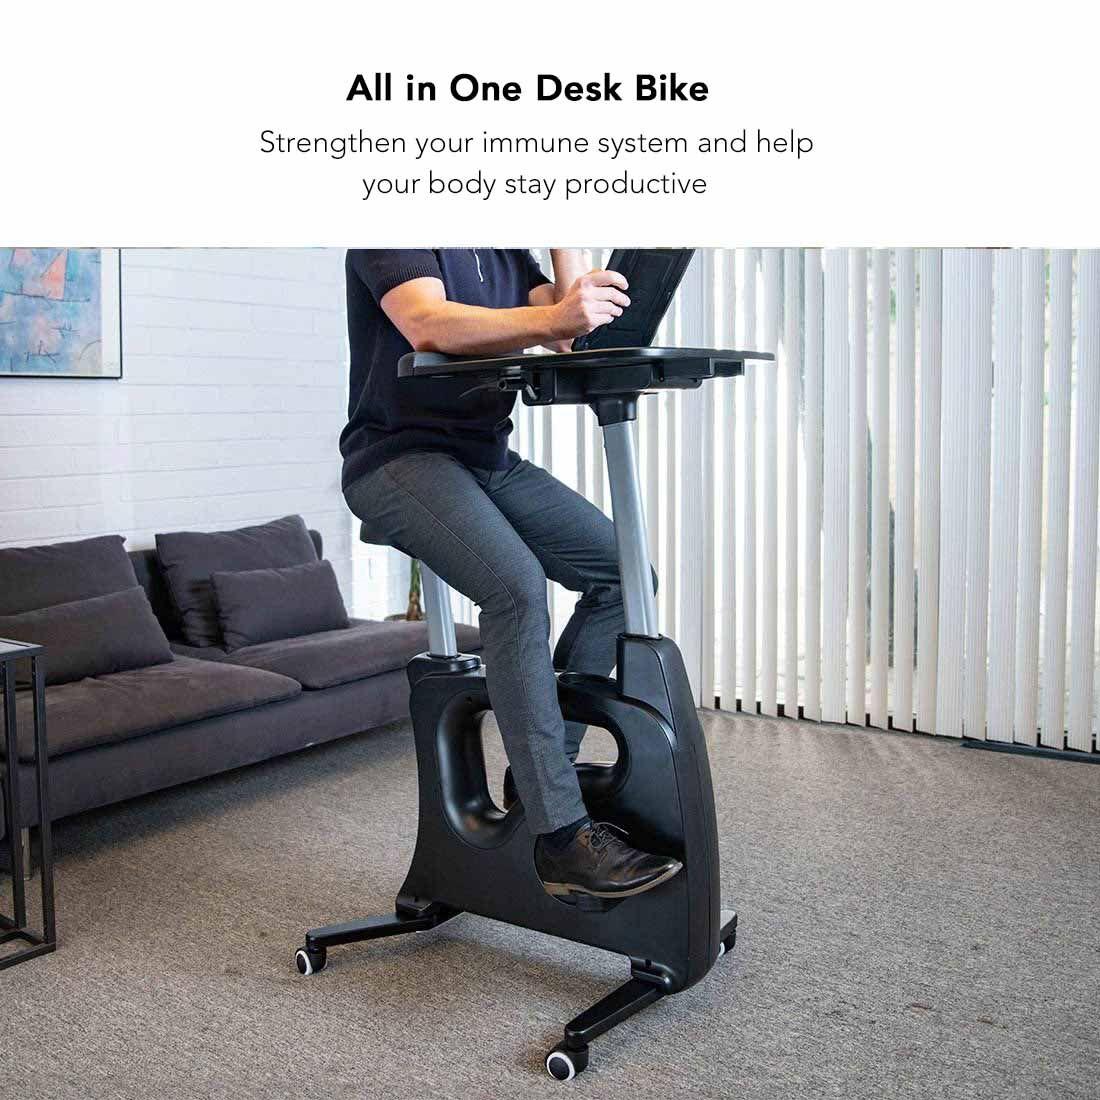 Flexispot desk bike reviews